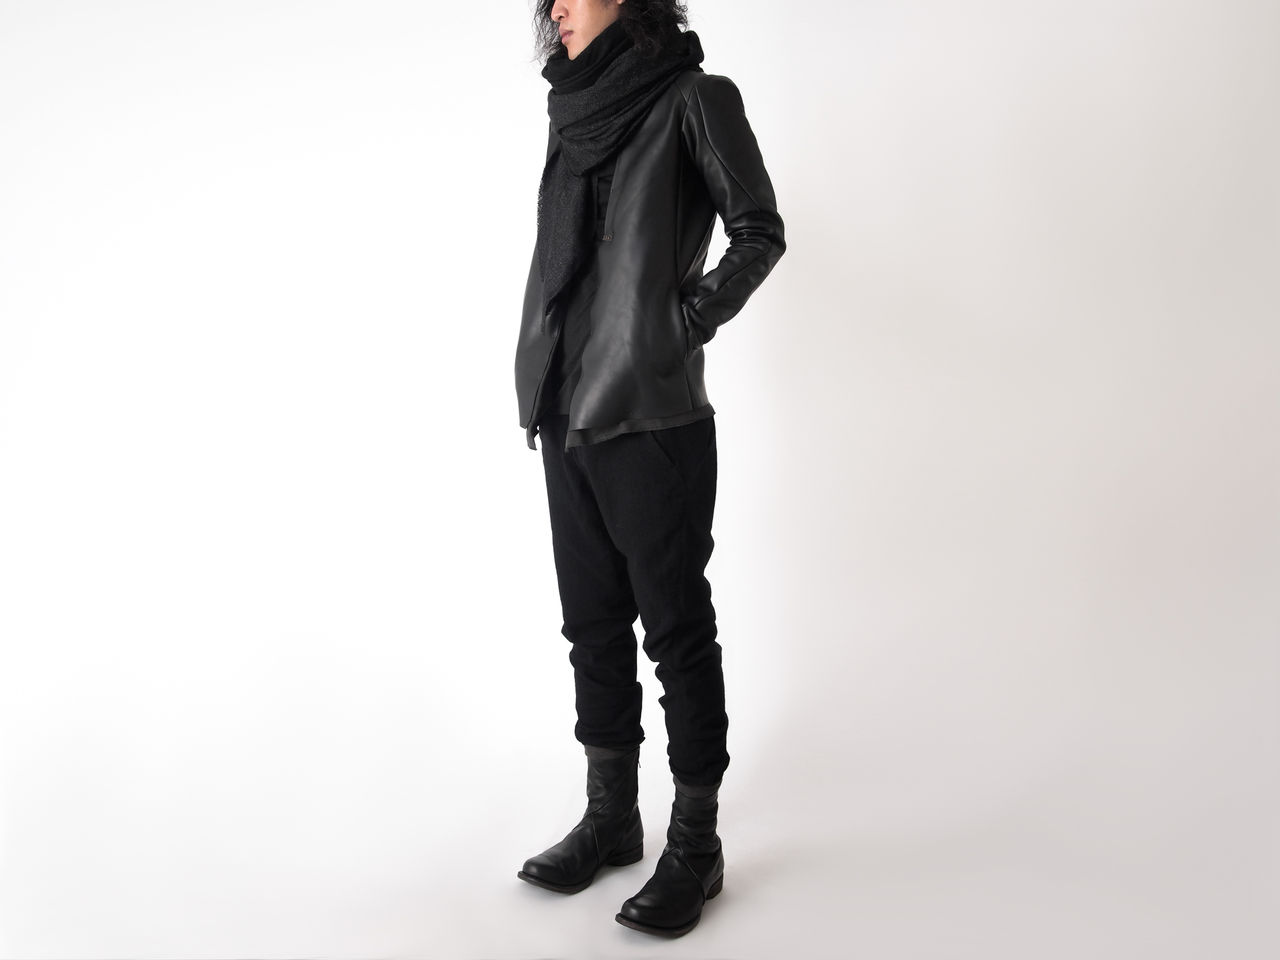 styling_3_1